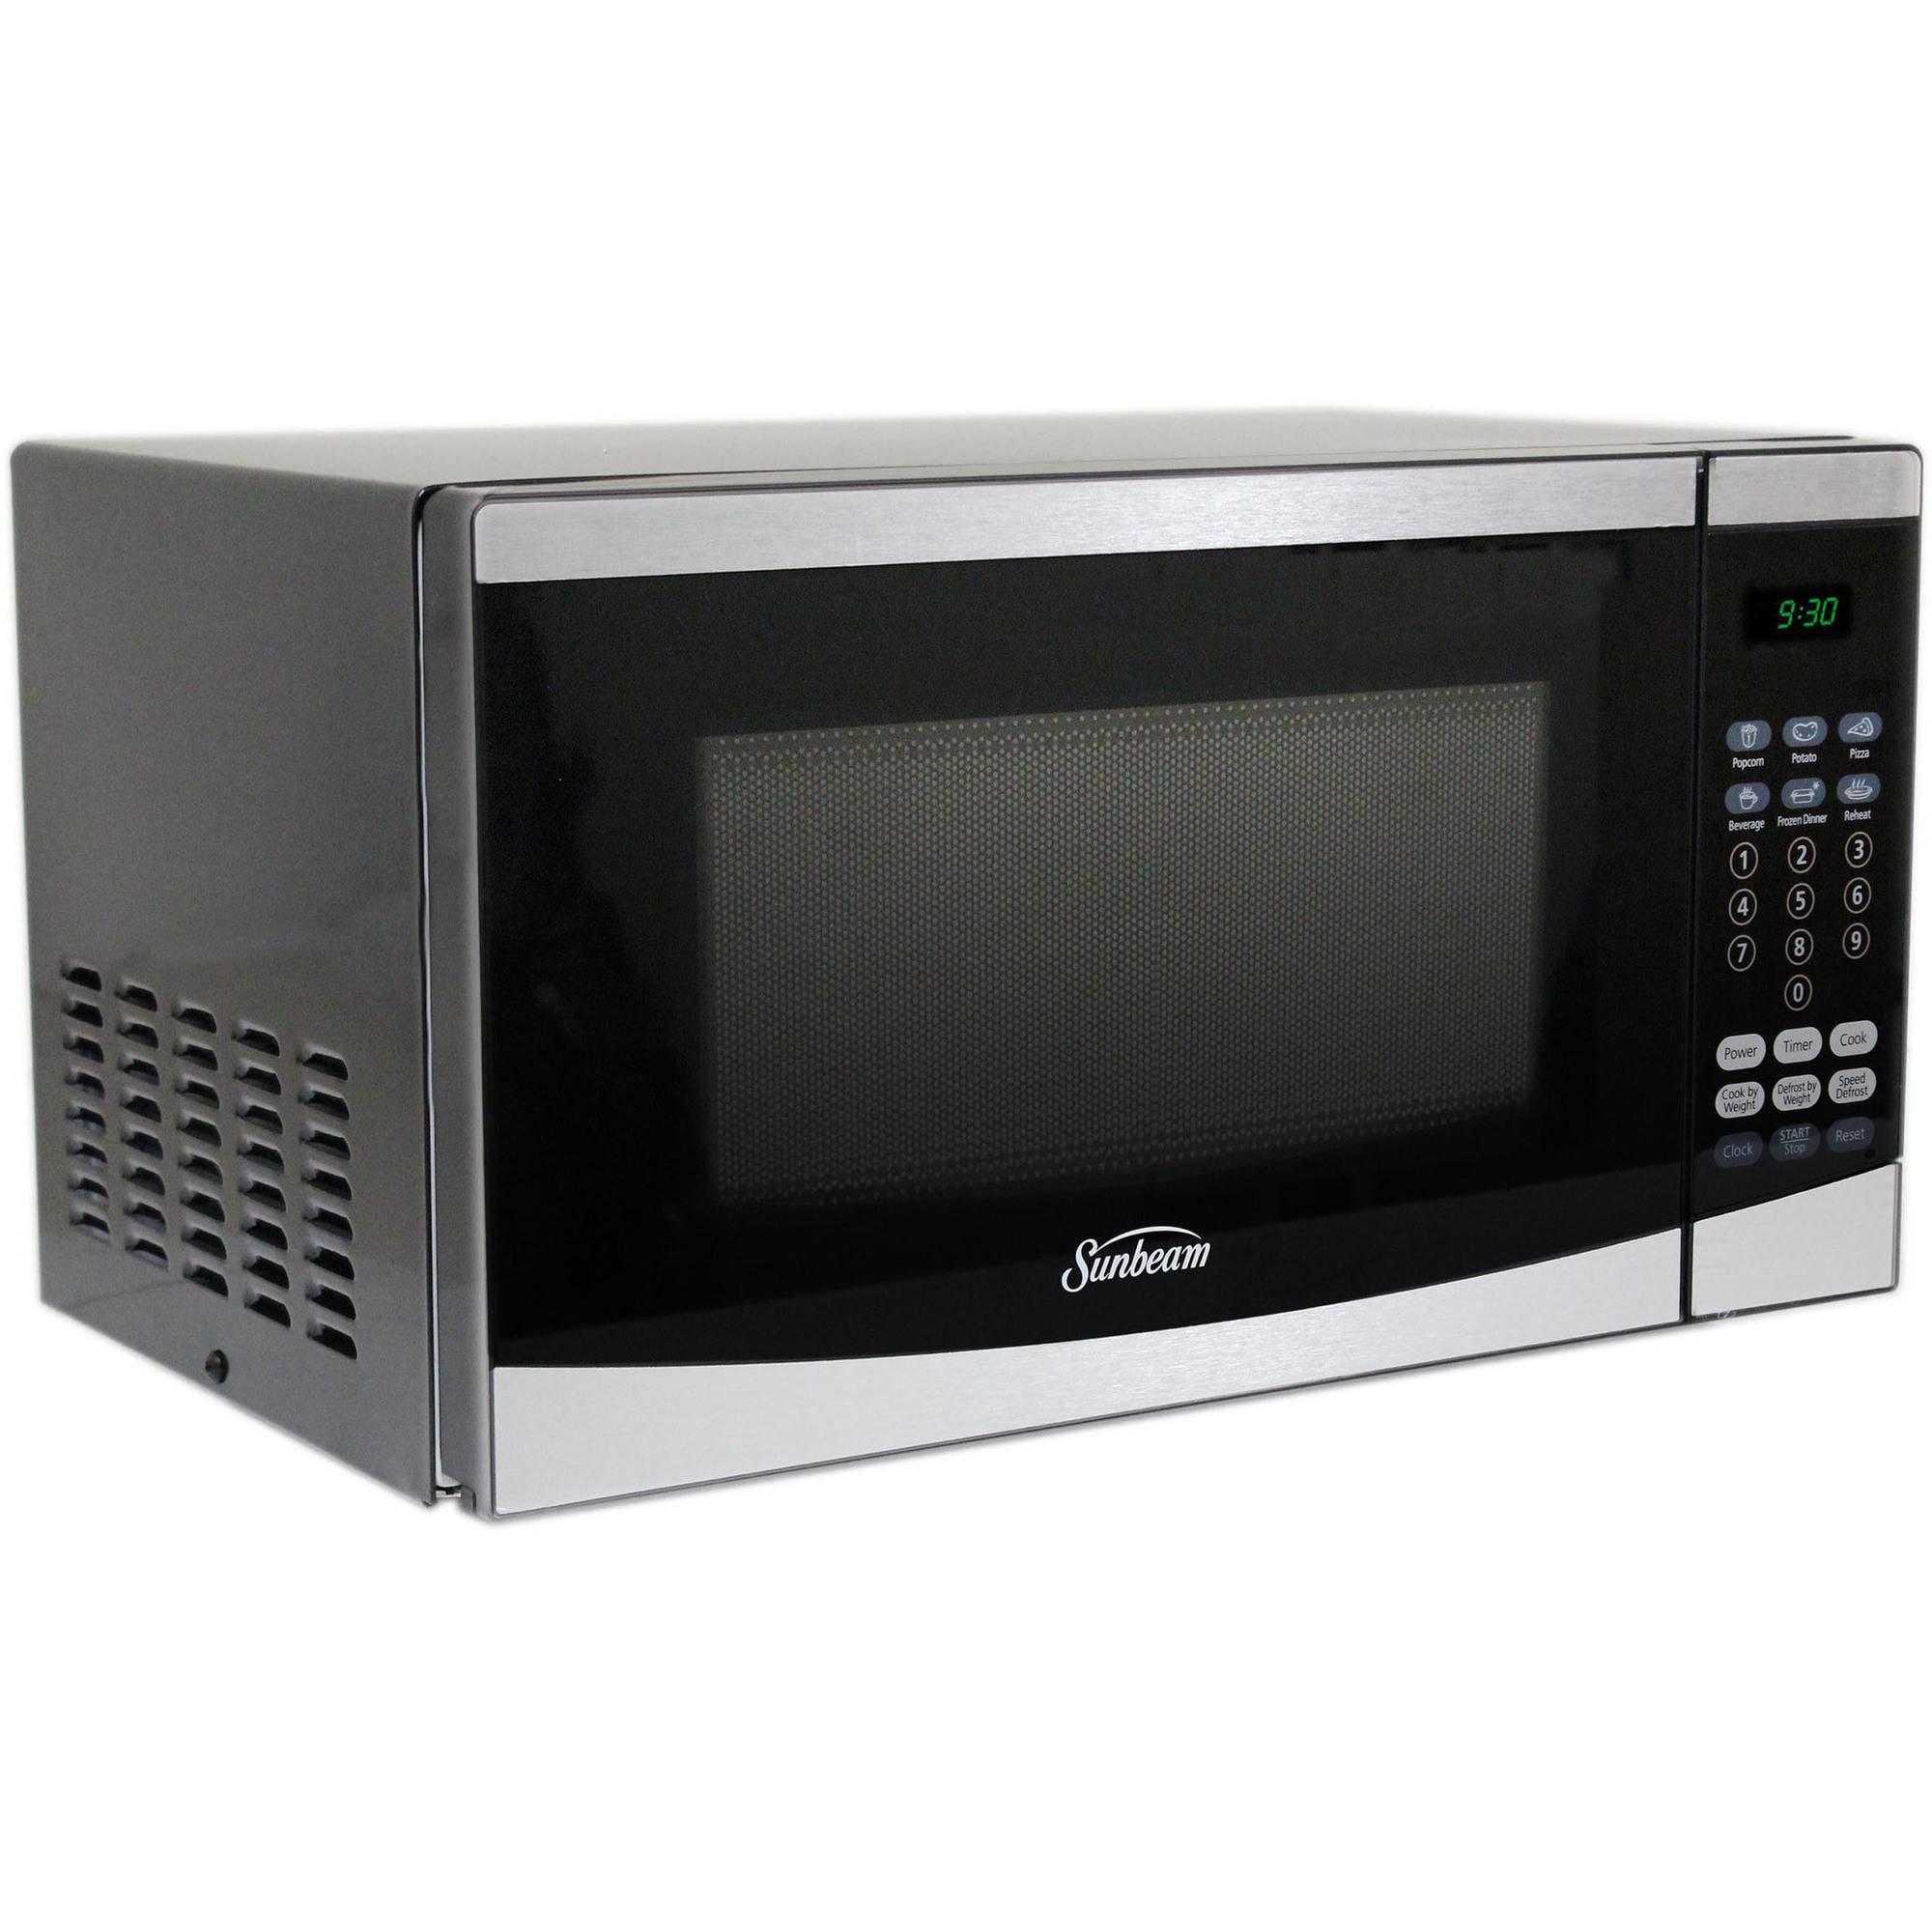 Sunbeam Ft Cu 0 7 Microwave Stainless Steel